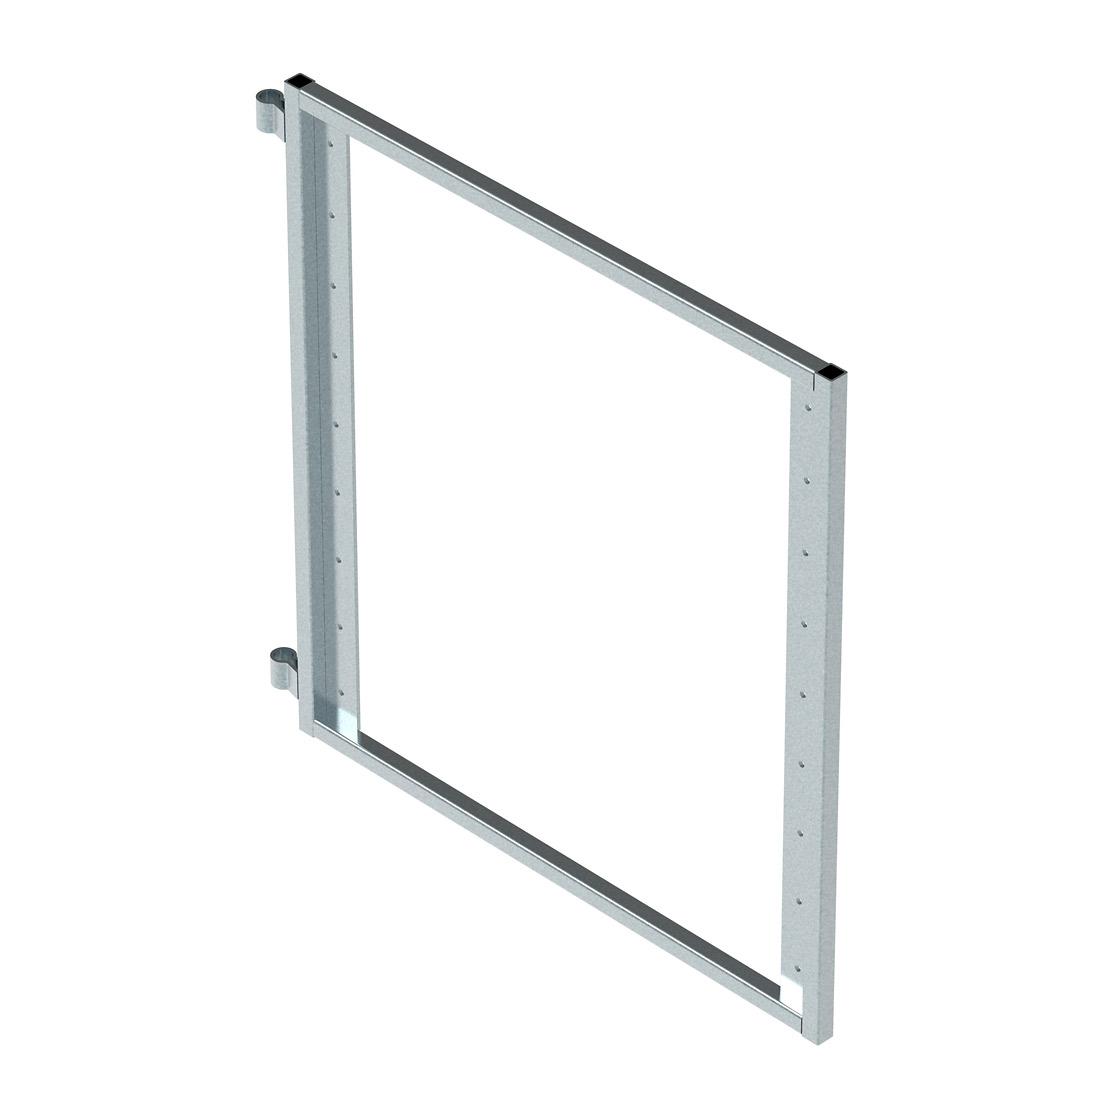 Sheepyard gate 800mm x 850mm (frame only)